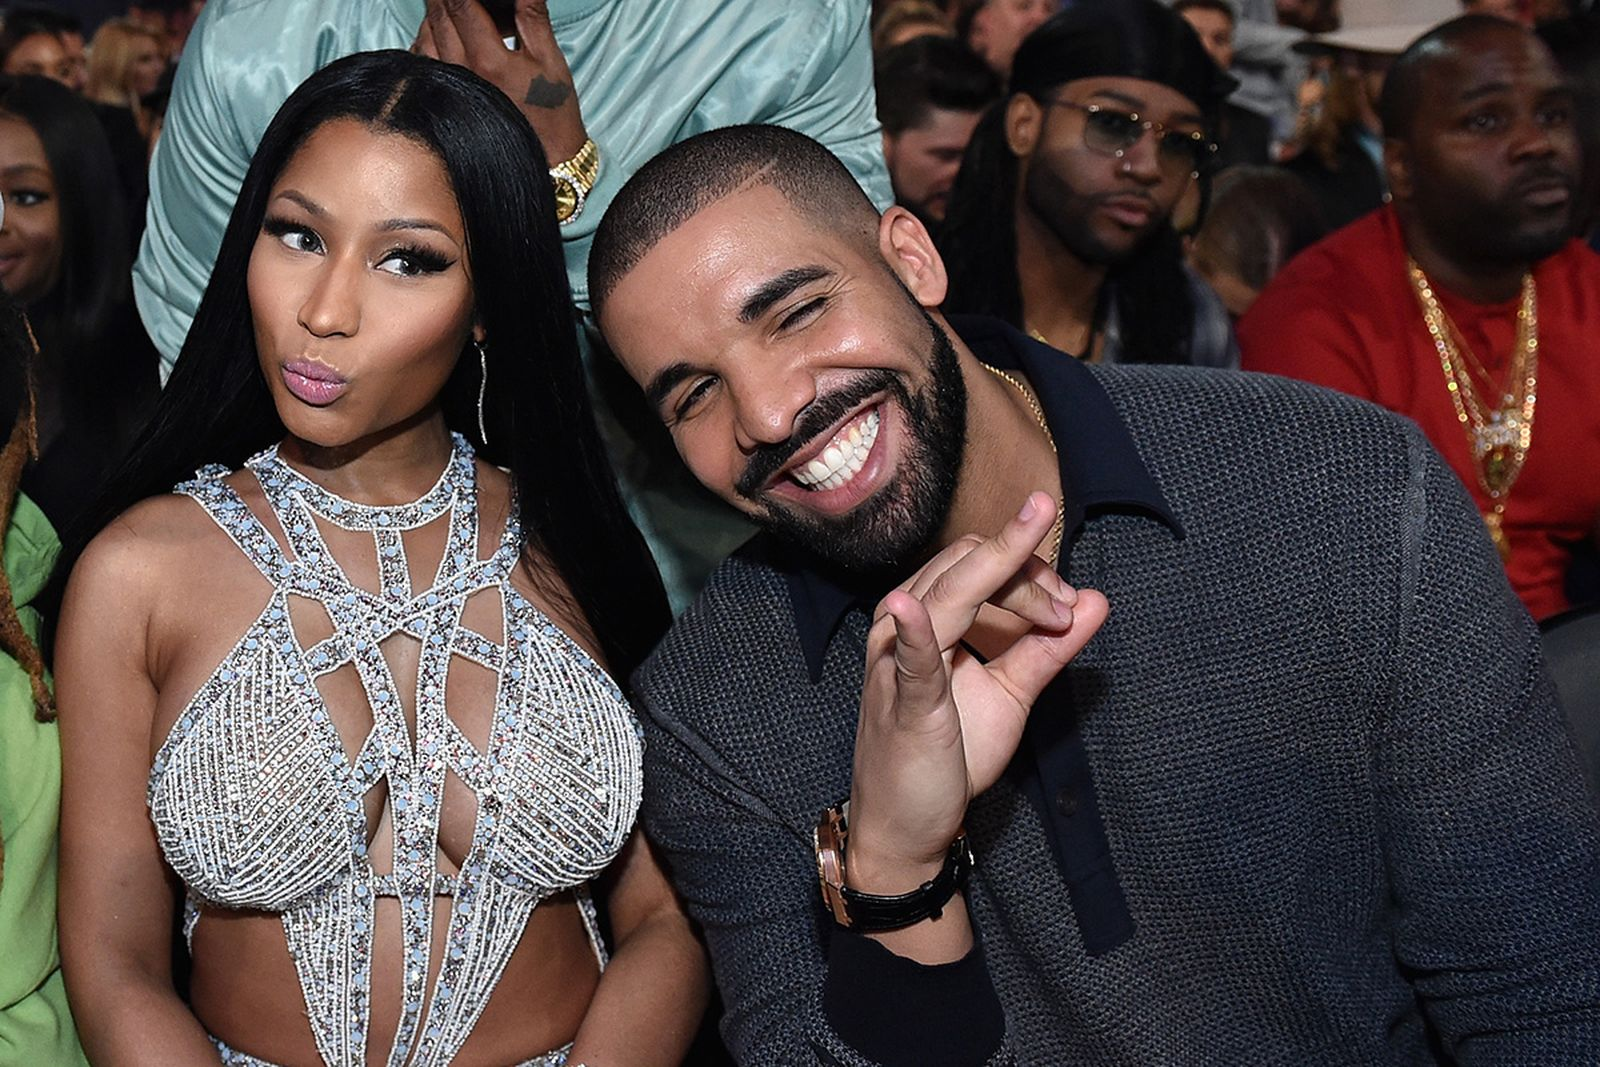 Nicki Minaj and Drake attend the 2017 Billboard Music Awards